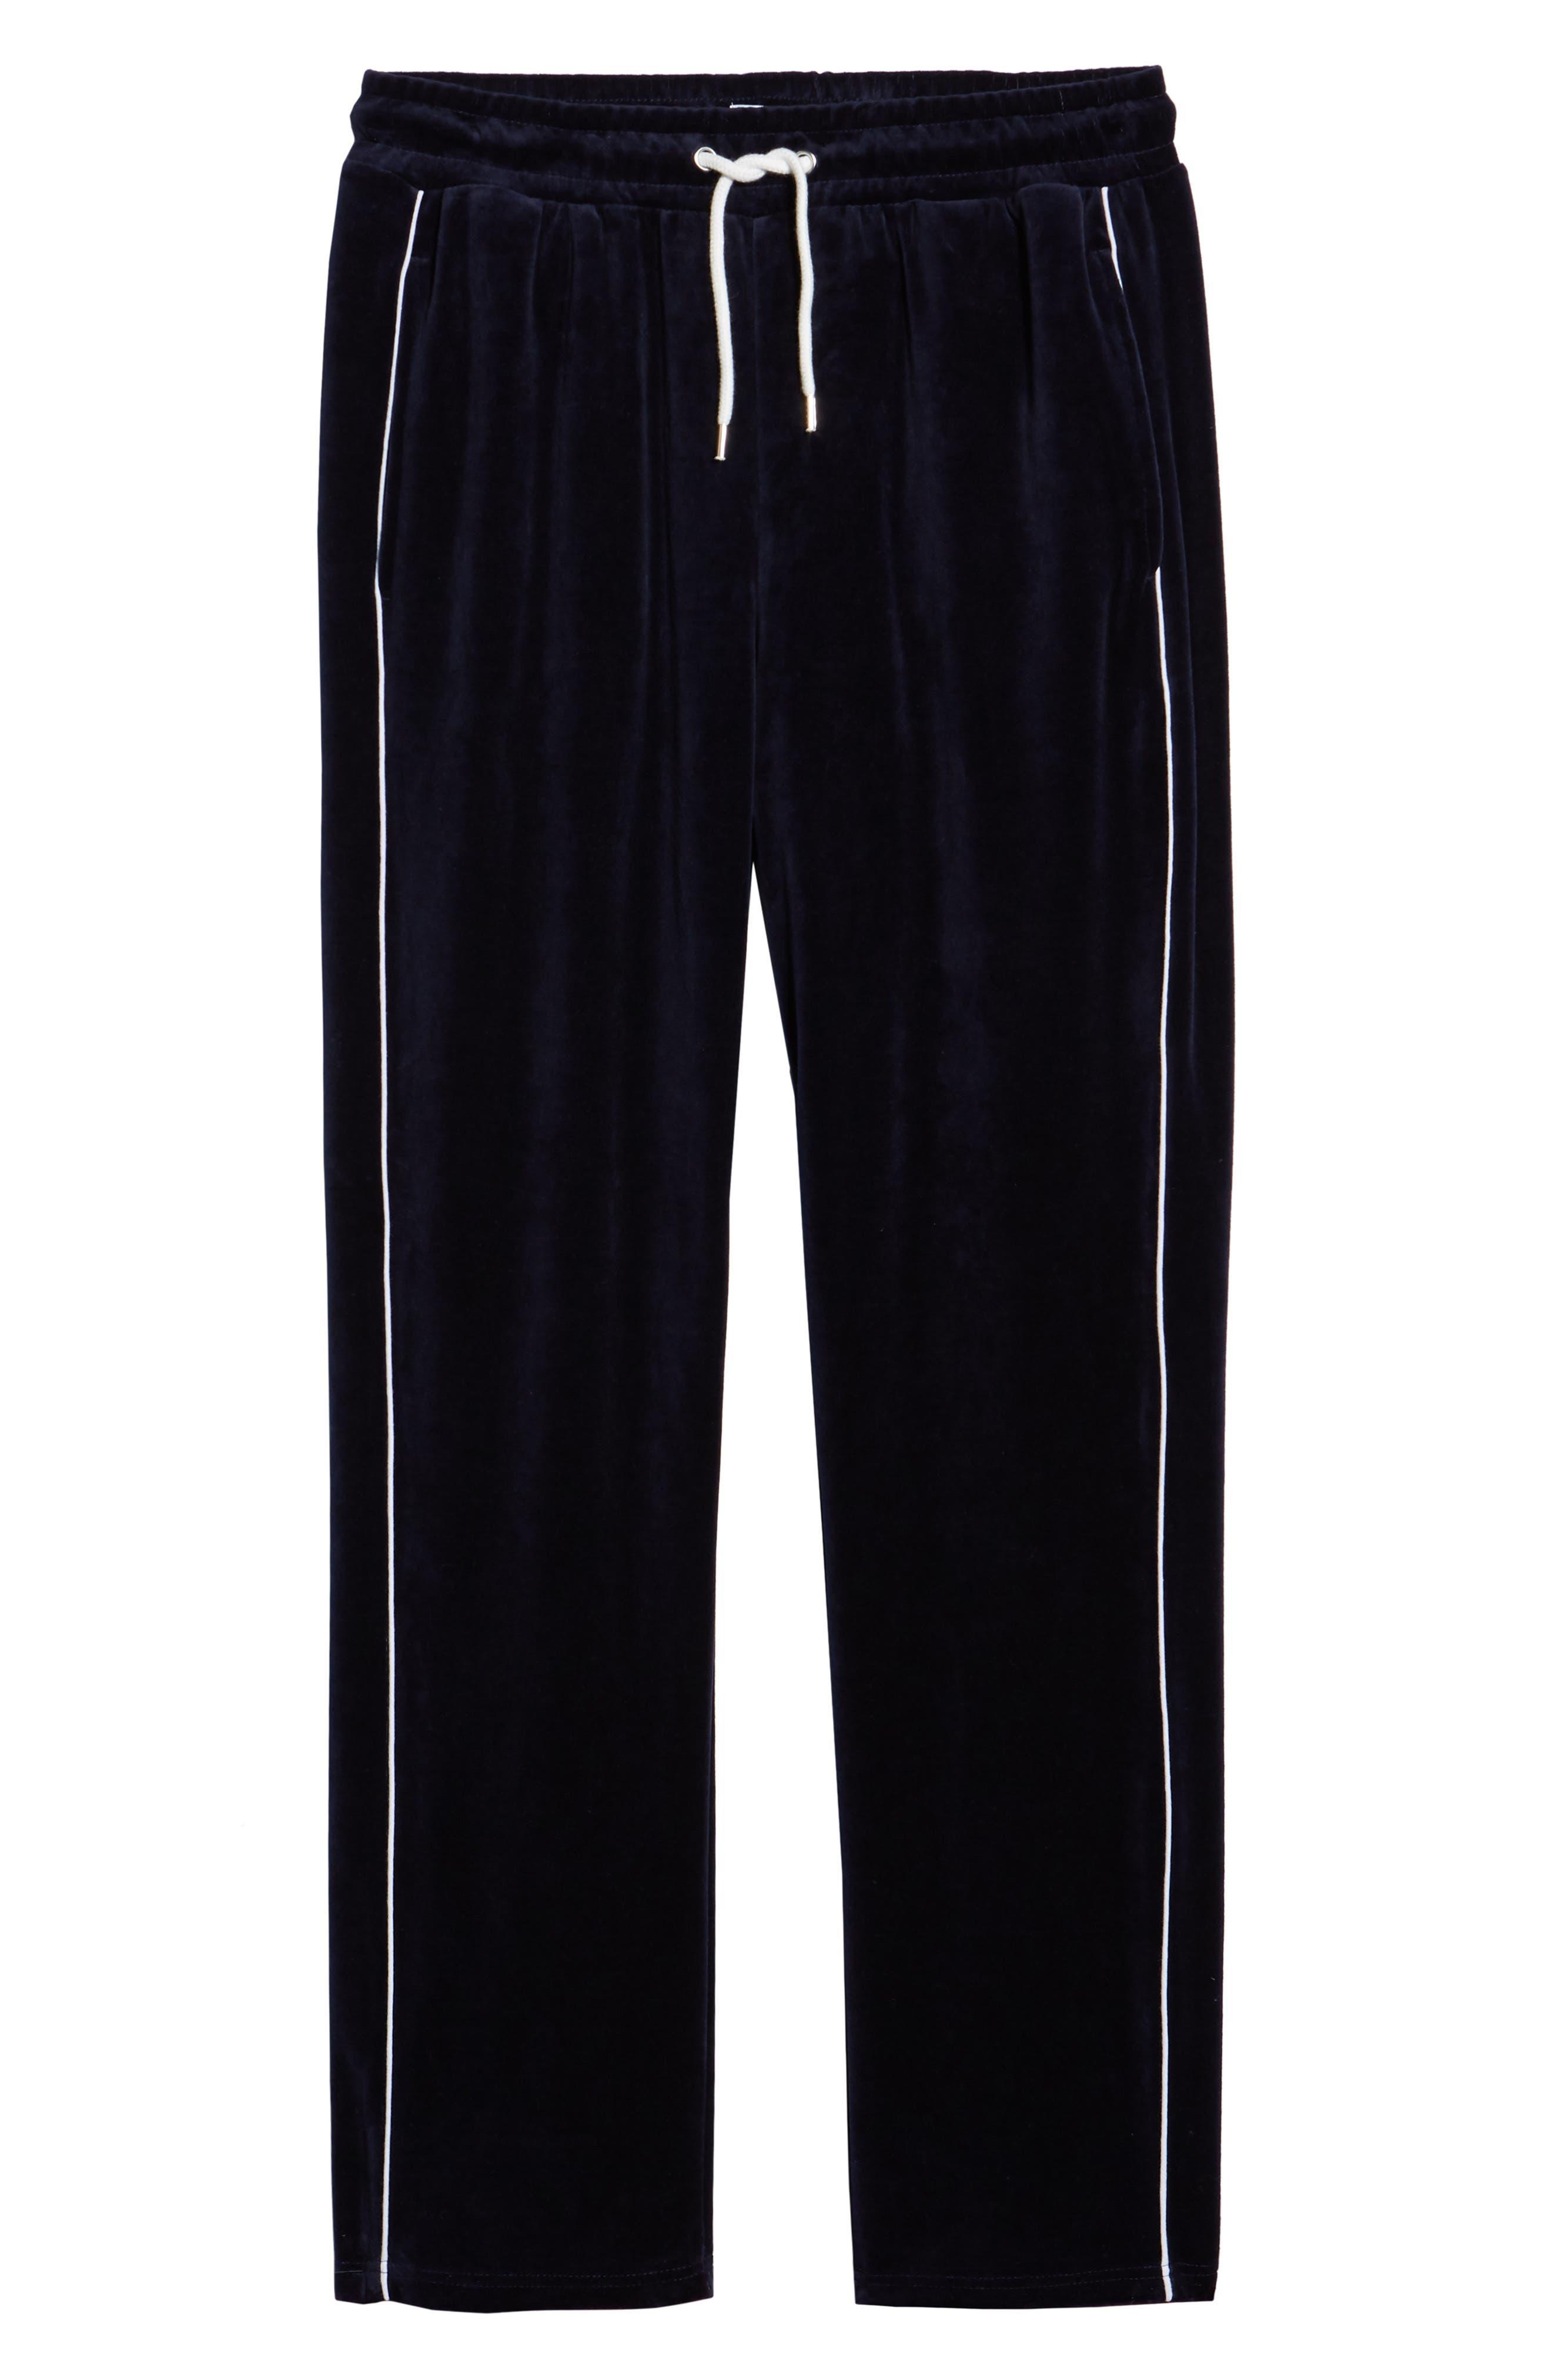 Velour Pants,                             Alternate thumbnail 6, color,                             NAVY BLUE